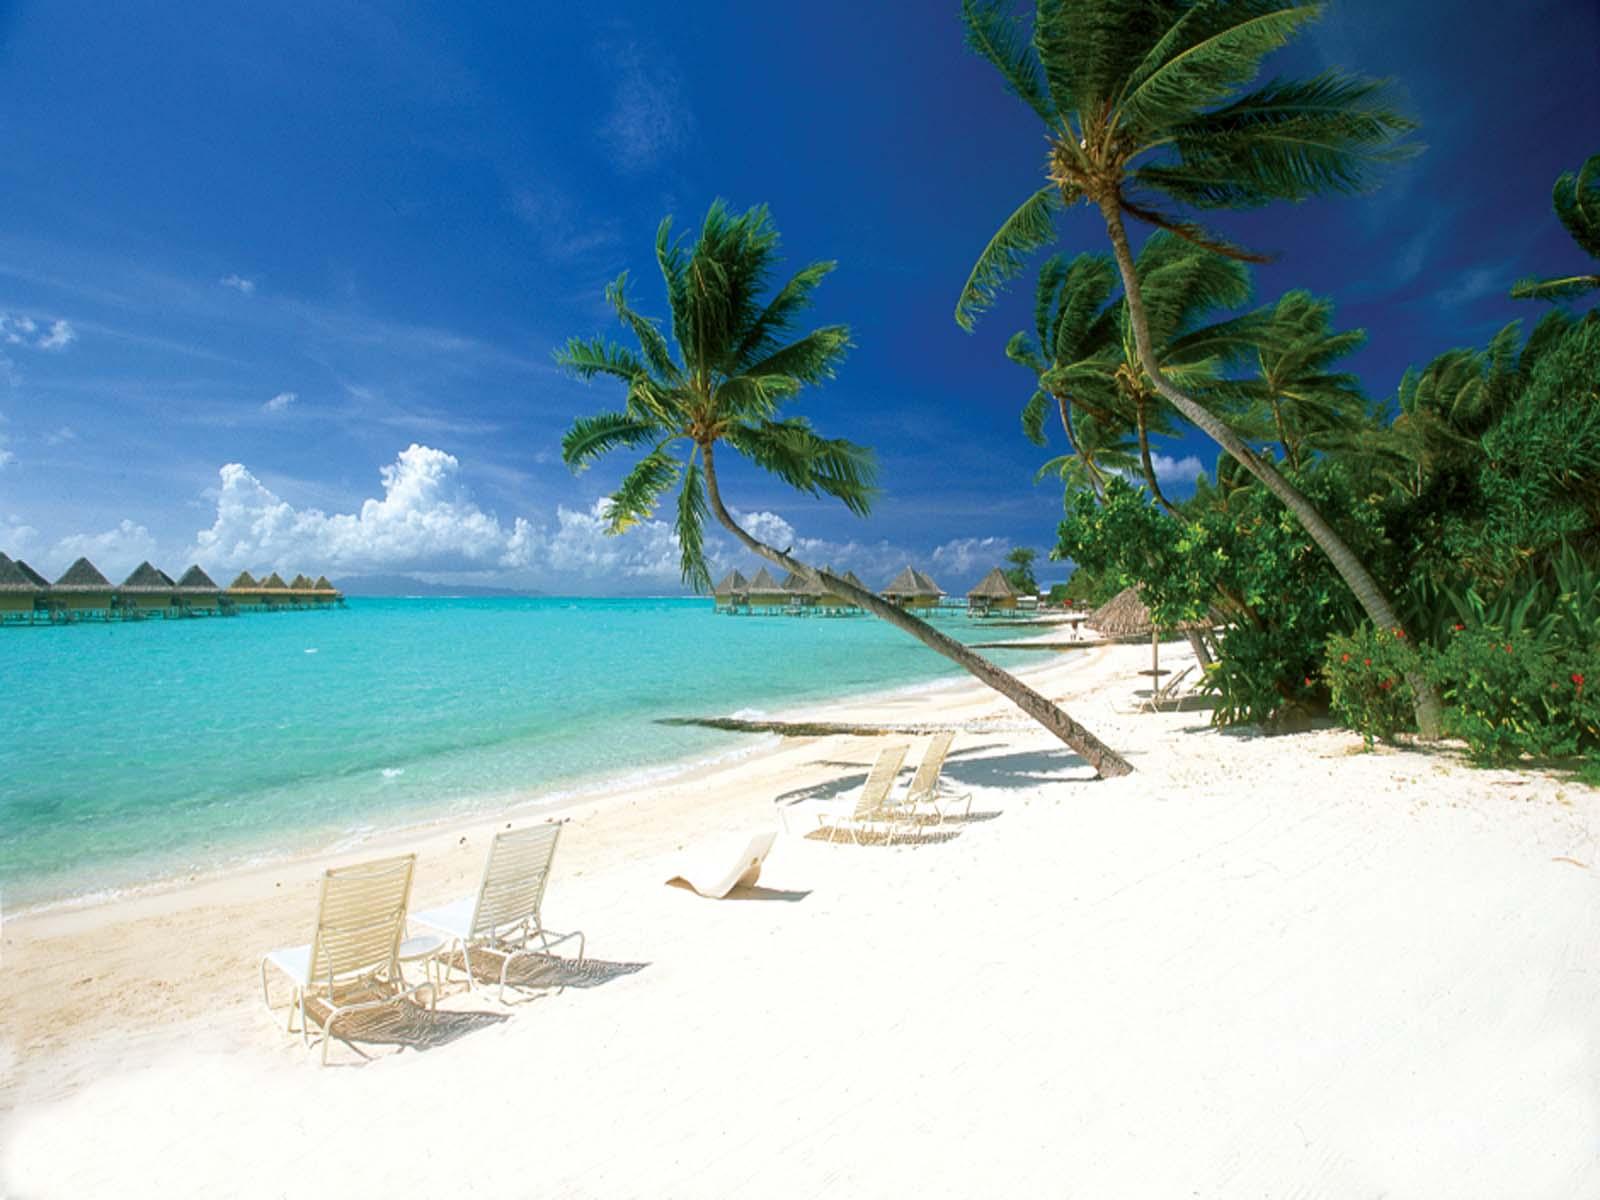 fond ecran mer gratuit Pacifique, ocean indien